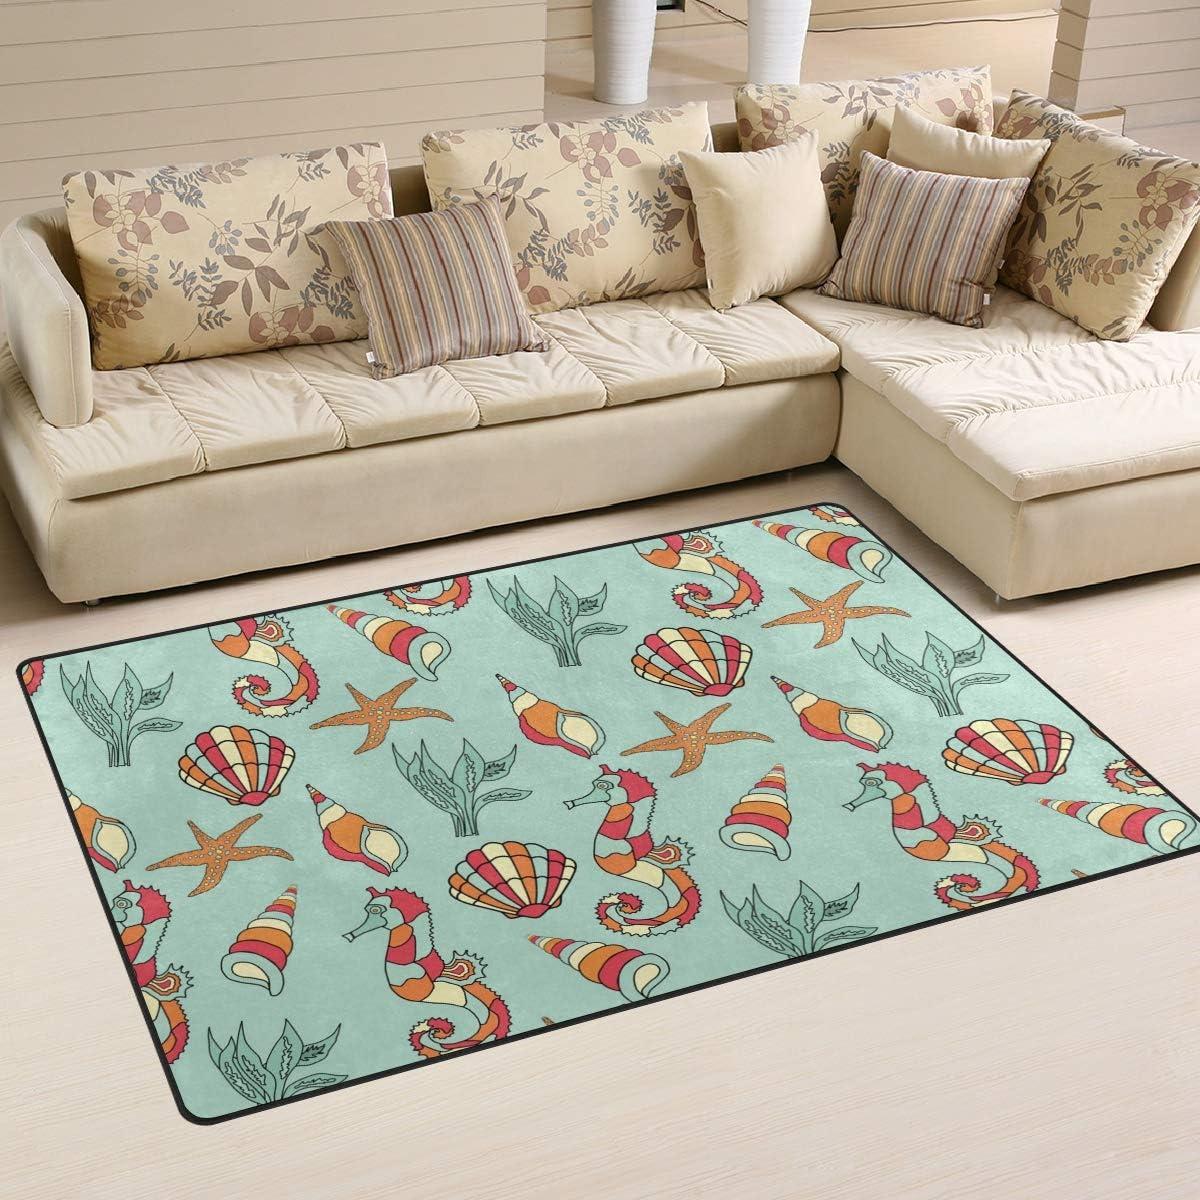 Ainans Seahorse Seashell Starfish Area Non-Slip Carpet Flo Free Shipping Cheap Bargain Gift Rapid rise Rug